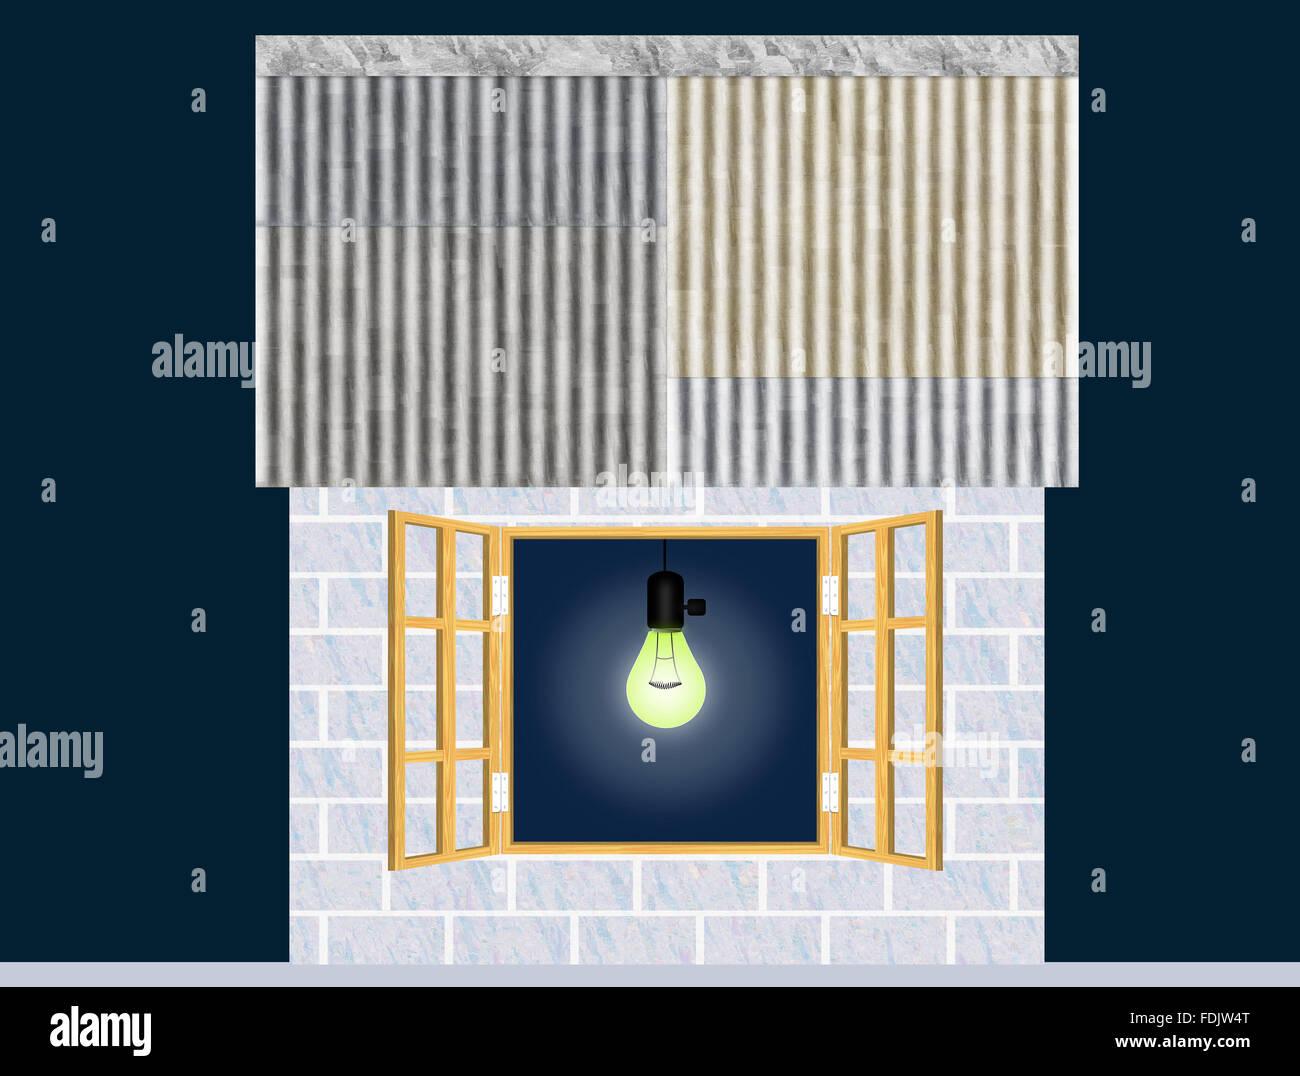 Humble Abode - Stock Image